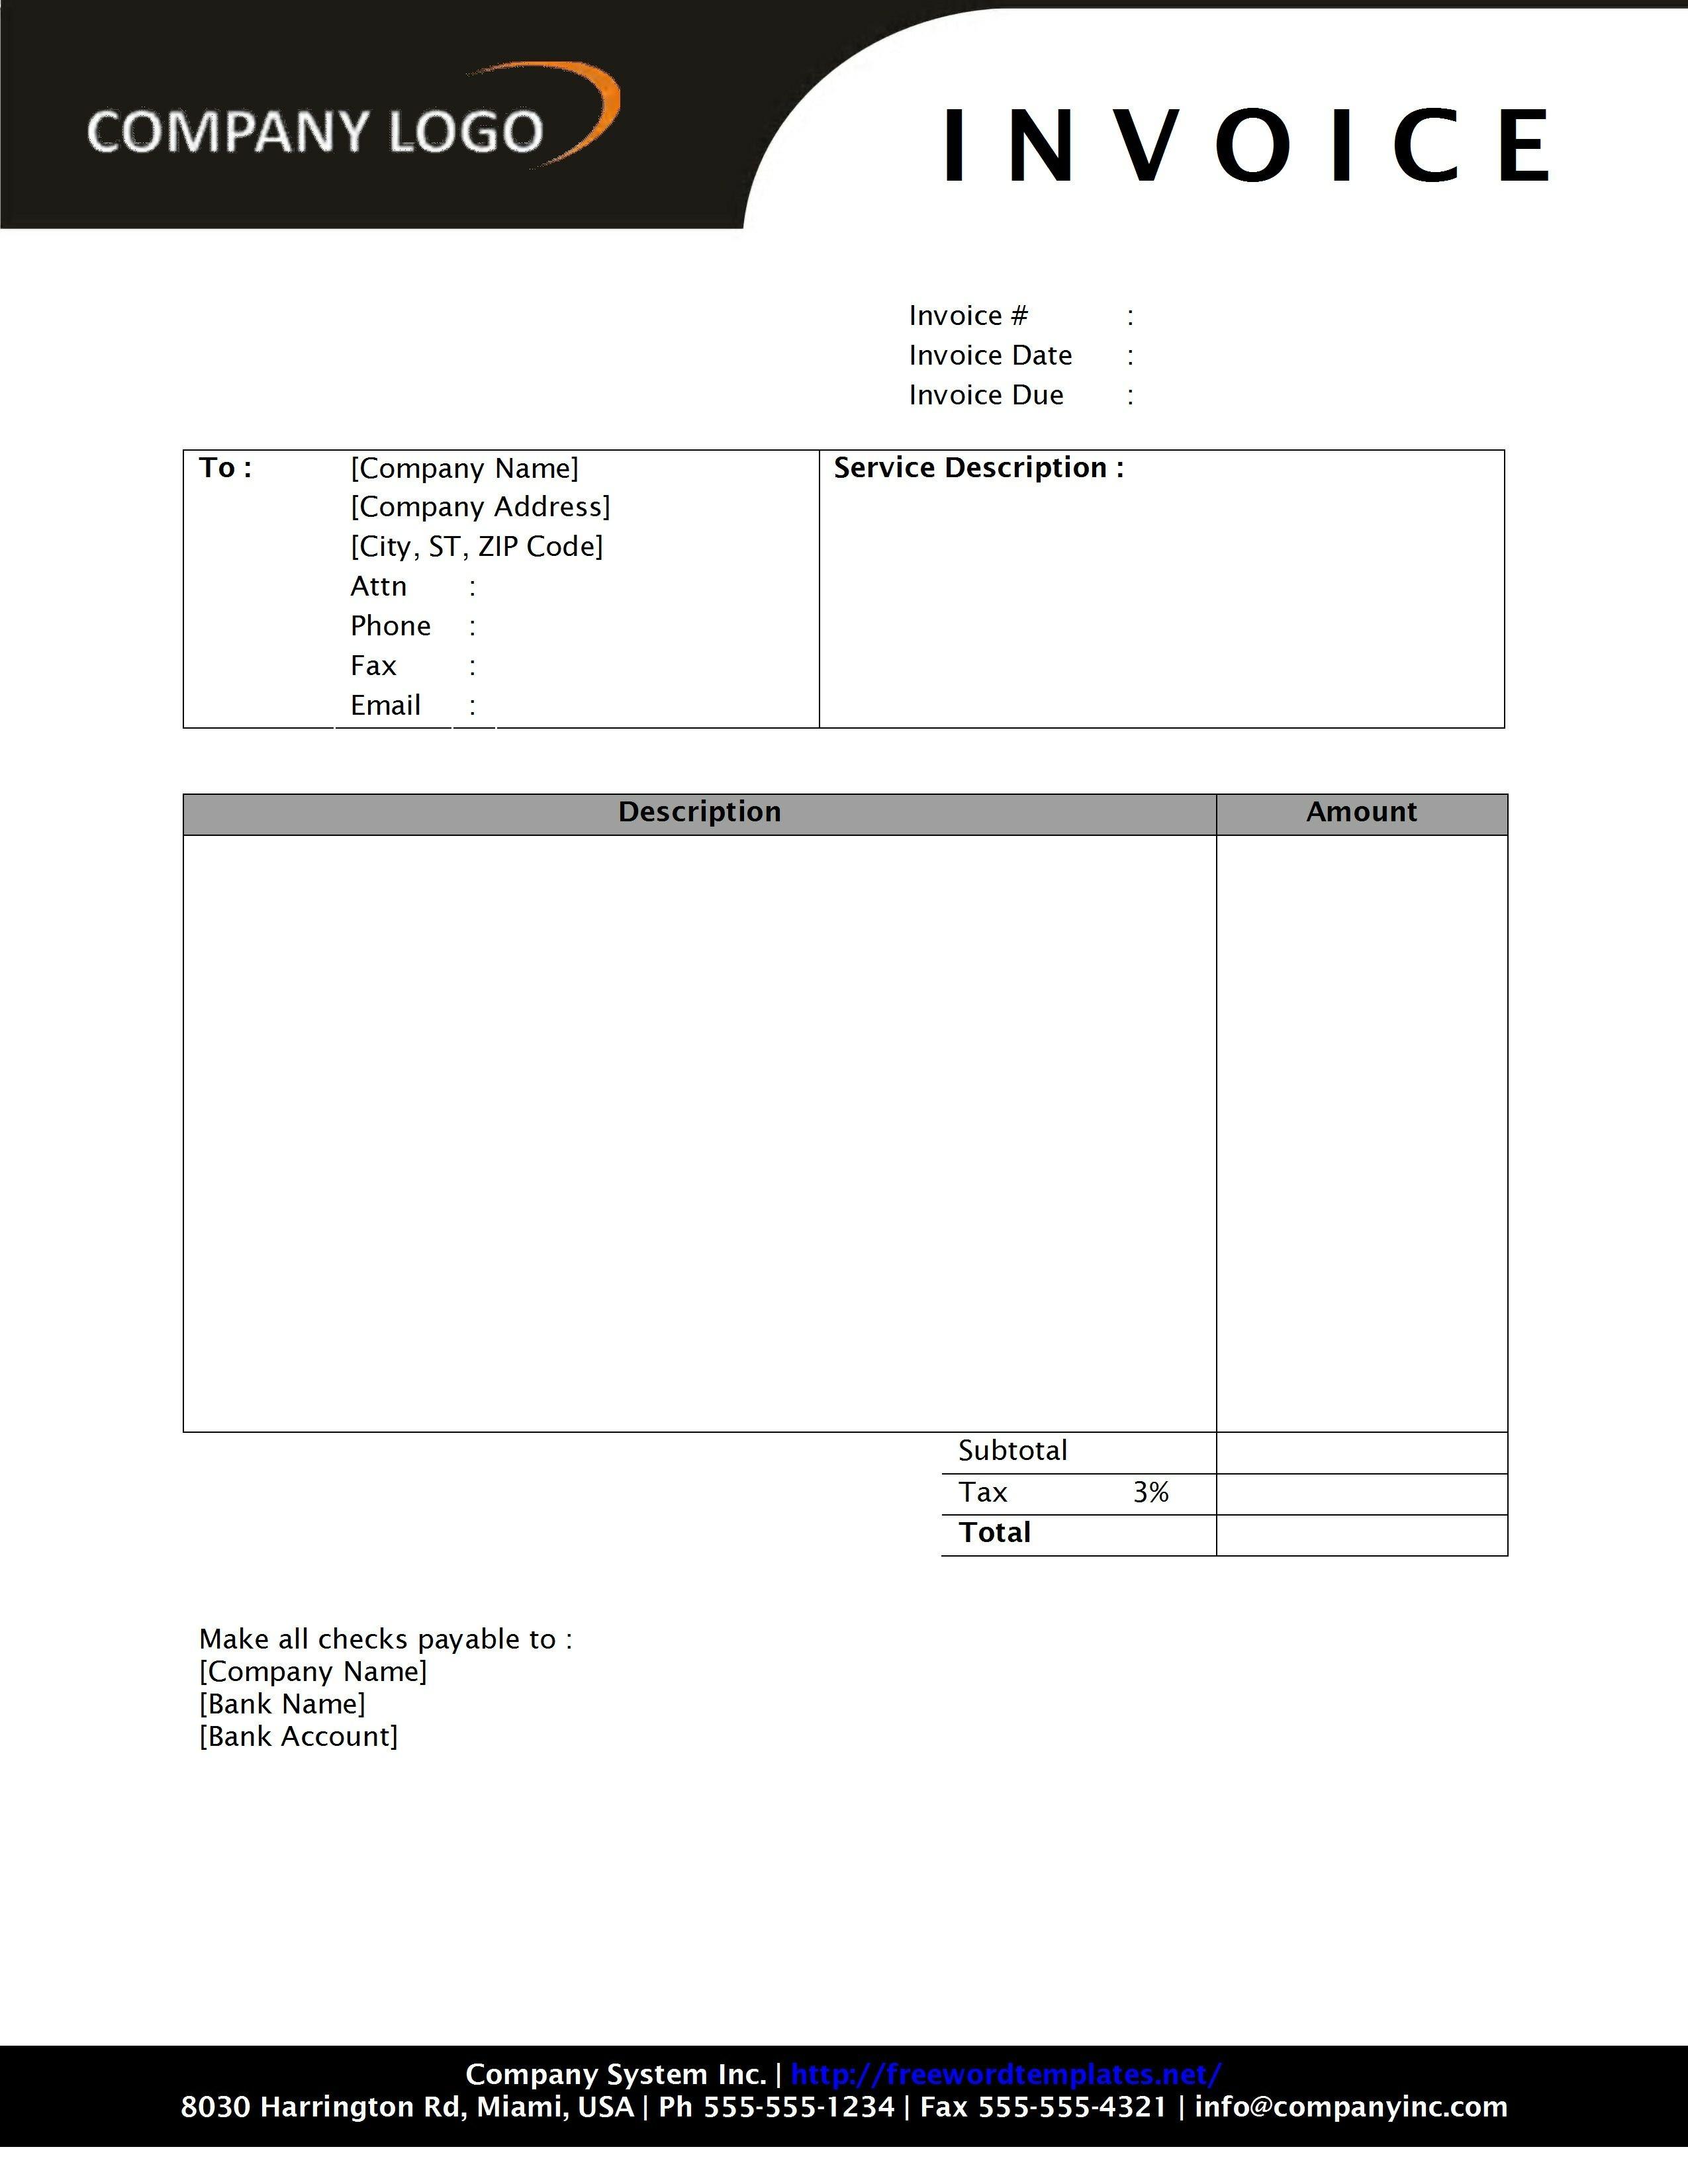 microsoft free invoice template * invoice template ideas, Invoice templates